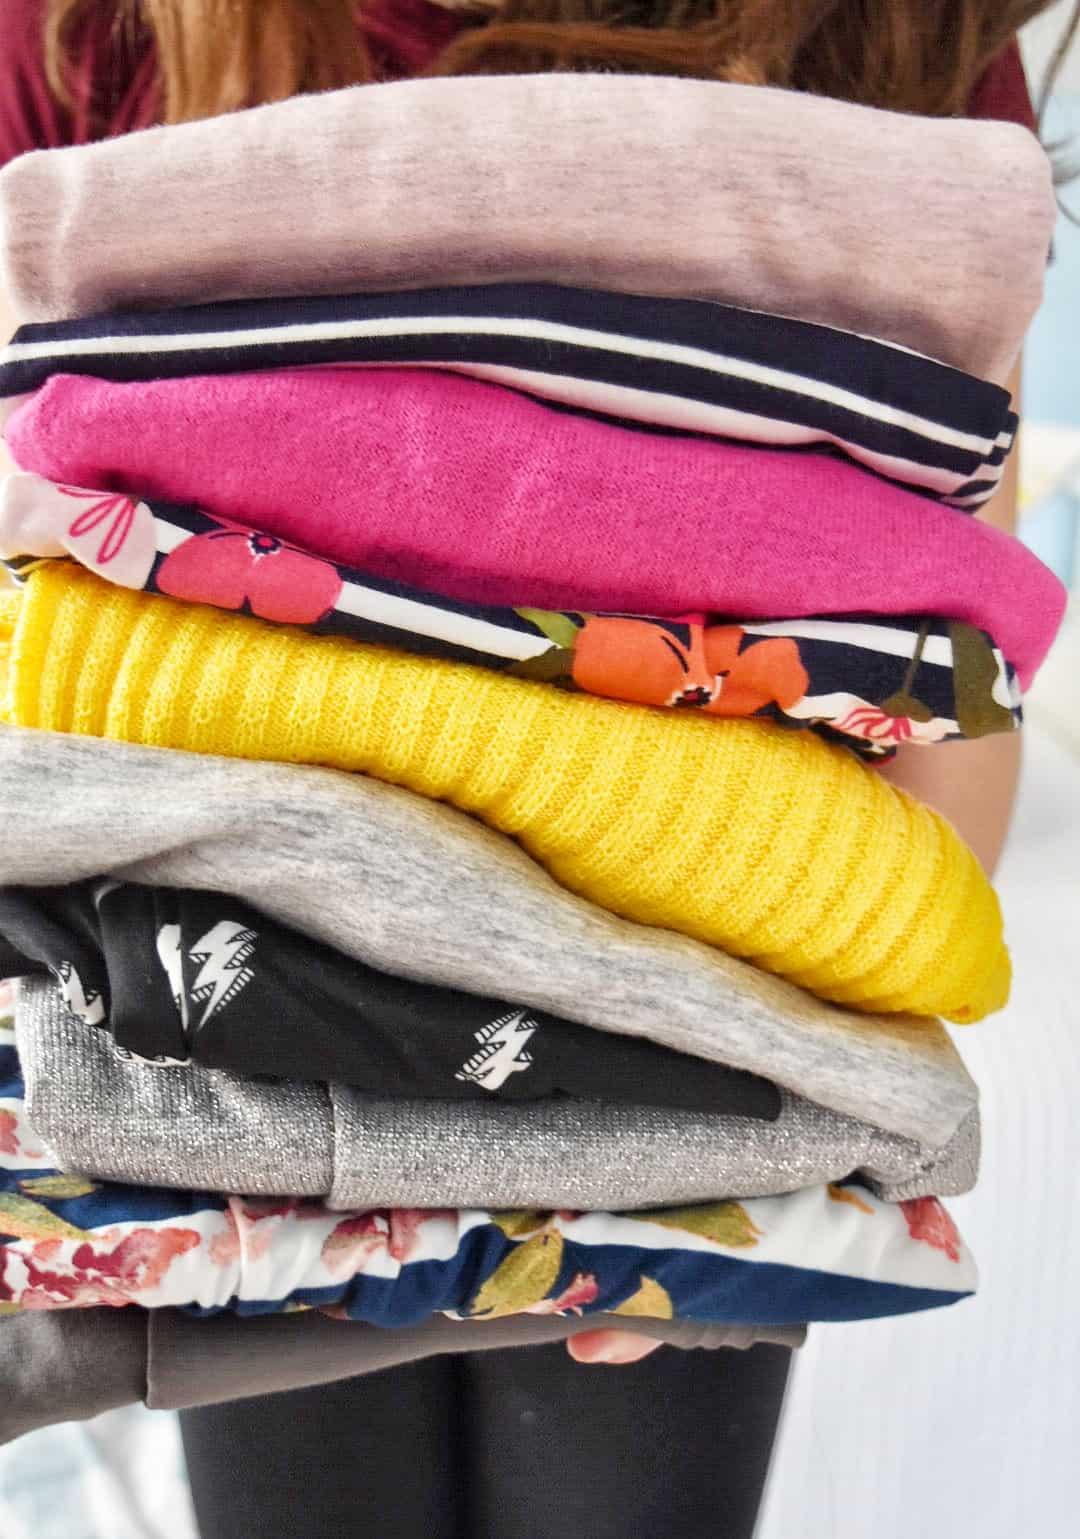 Stitch Fix Kids Clothing Box Review 2019 #kidsstyle #unboxing #subscriptionboxes #kids